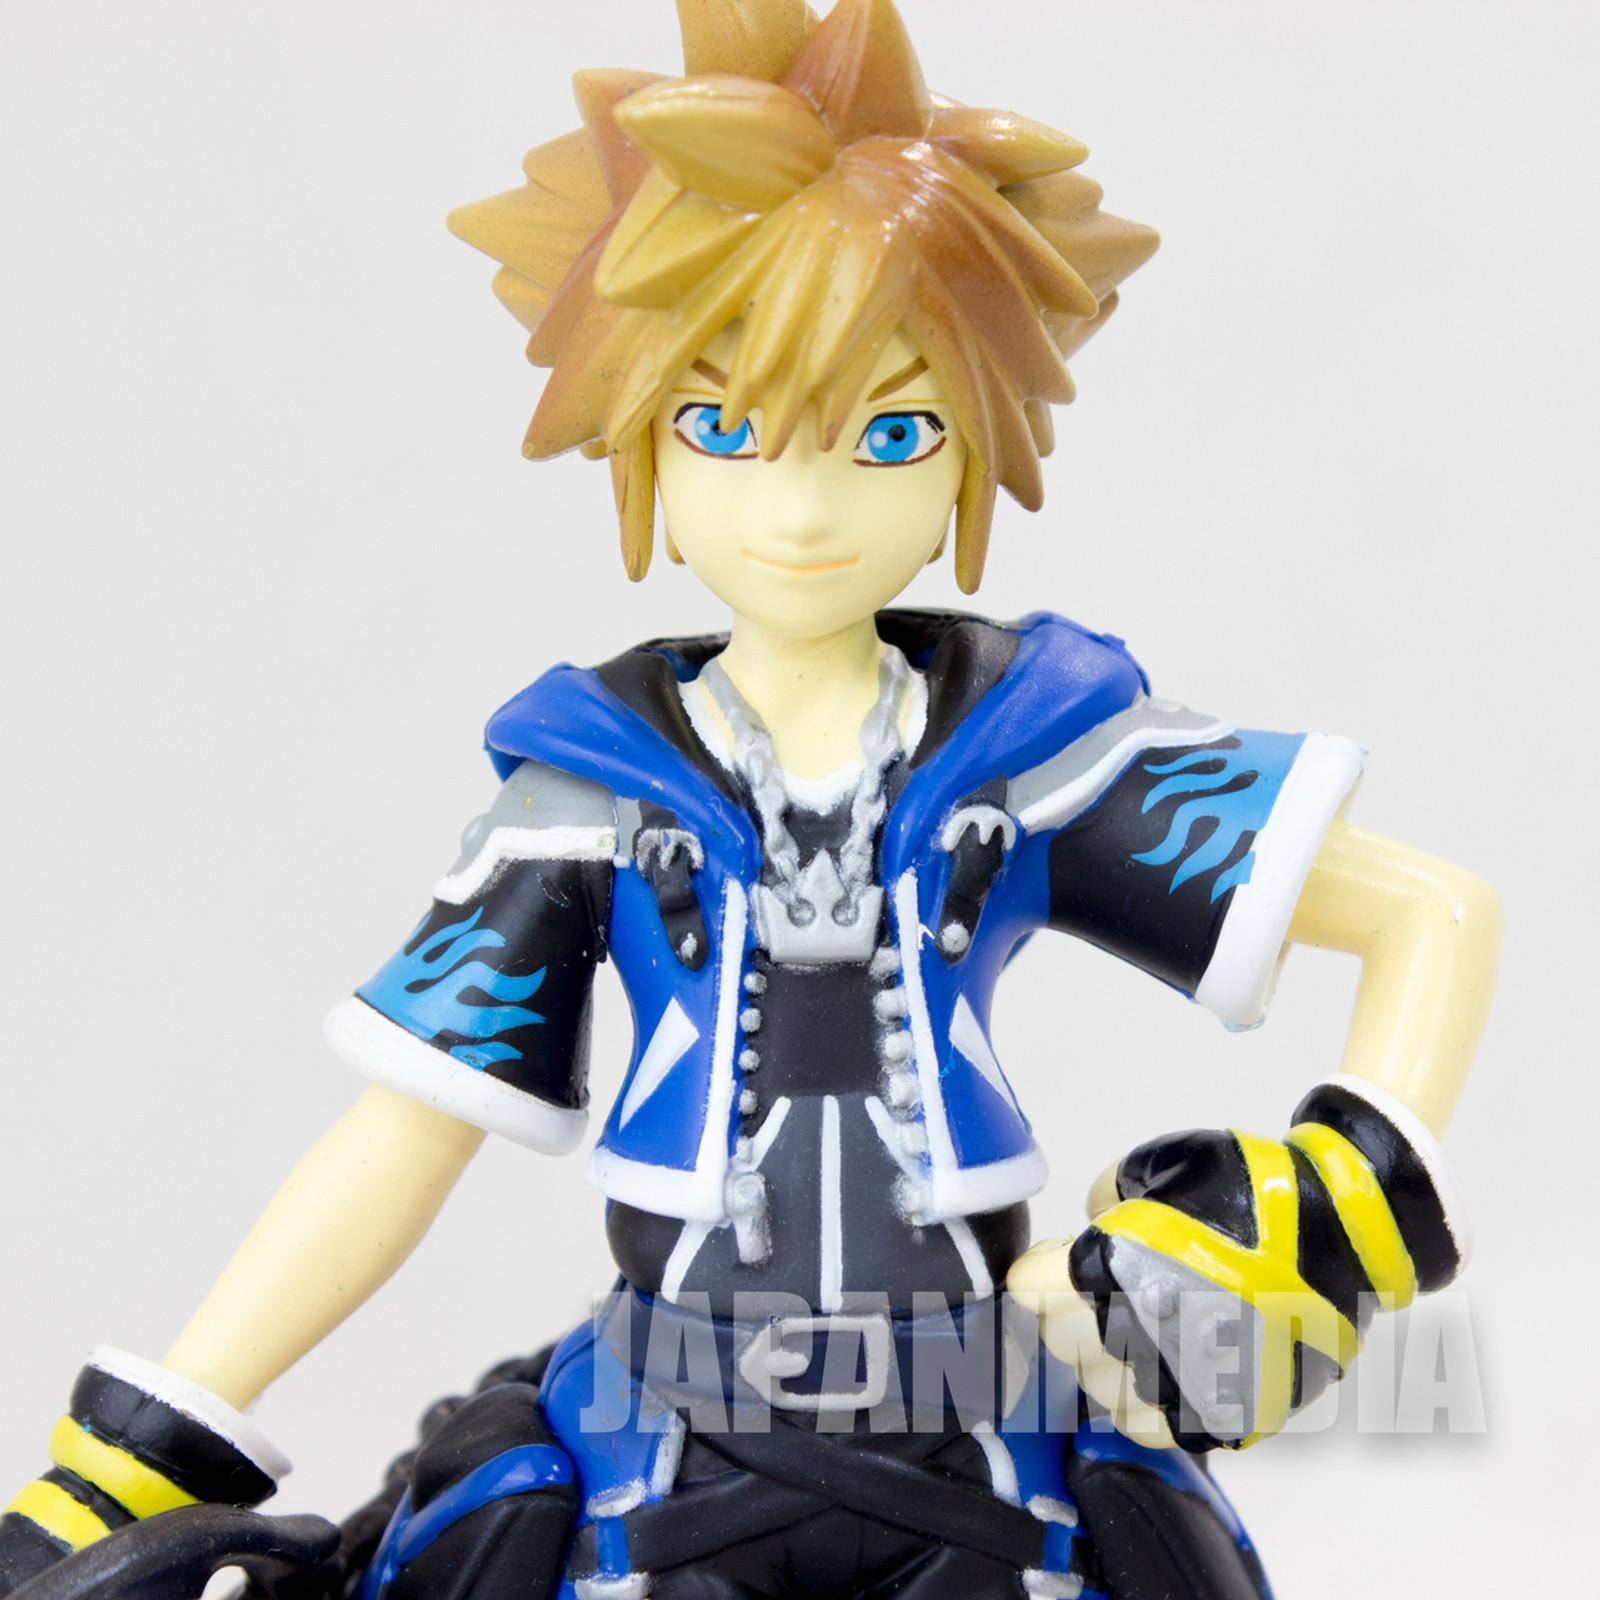 Kingdom Hearts SORA Disney Magical Collection Figure (Wisdom Form ver.) Tomy JAPAN